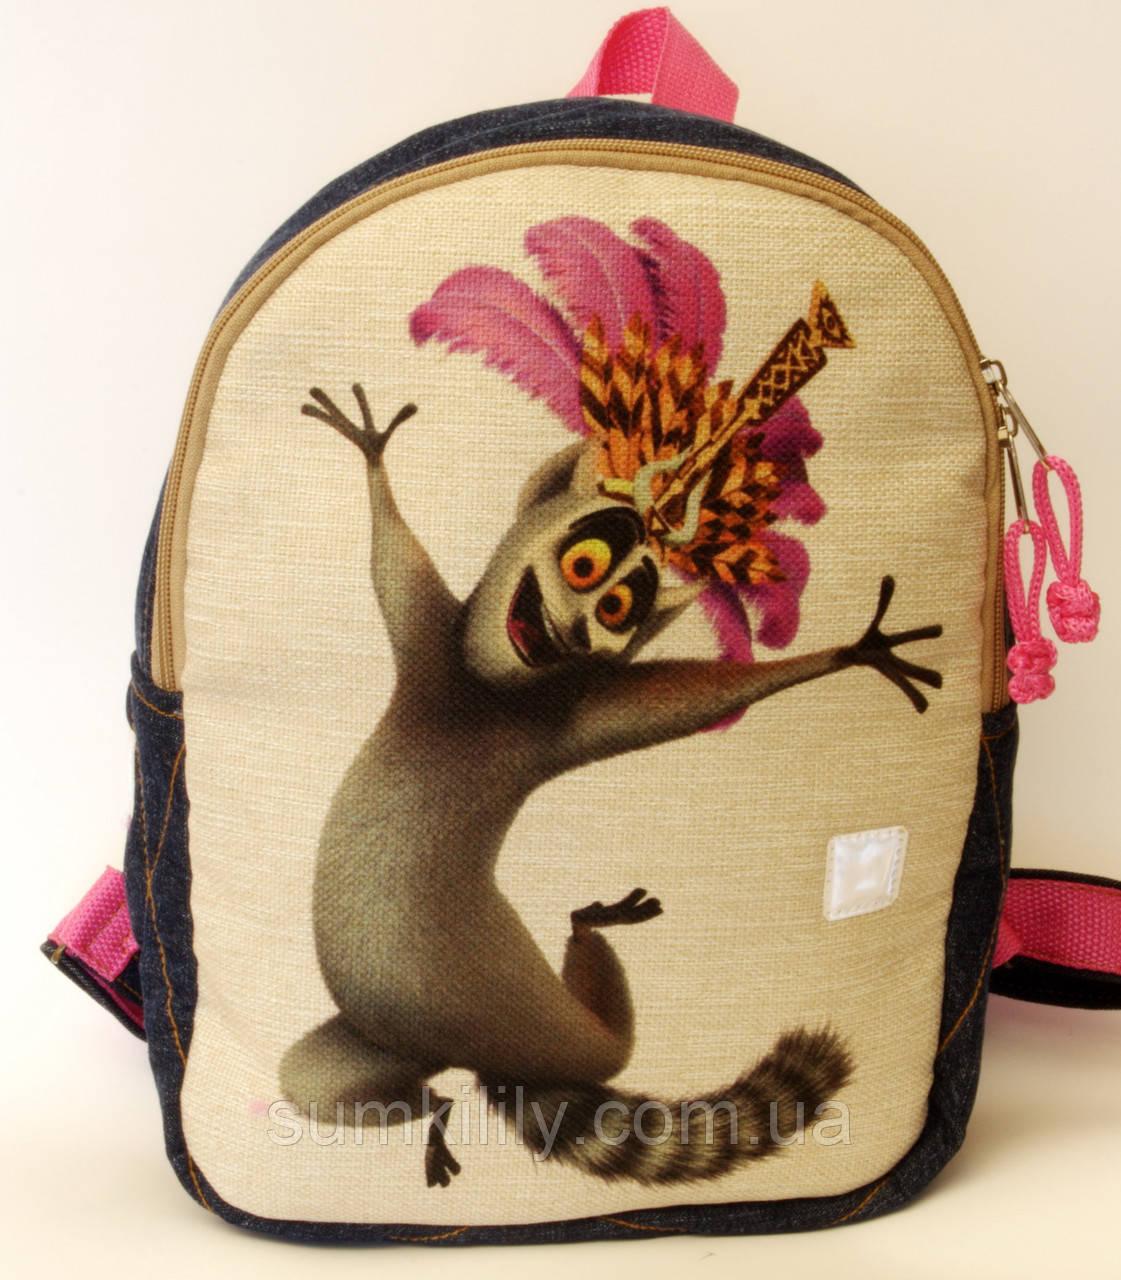 Детский рюкзак Мадагаскар король Джулиан